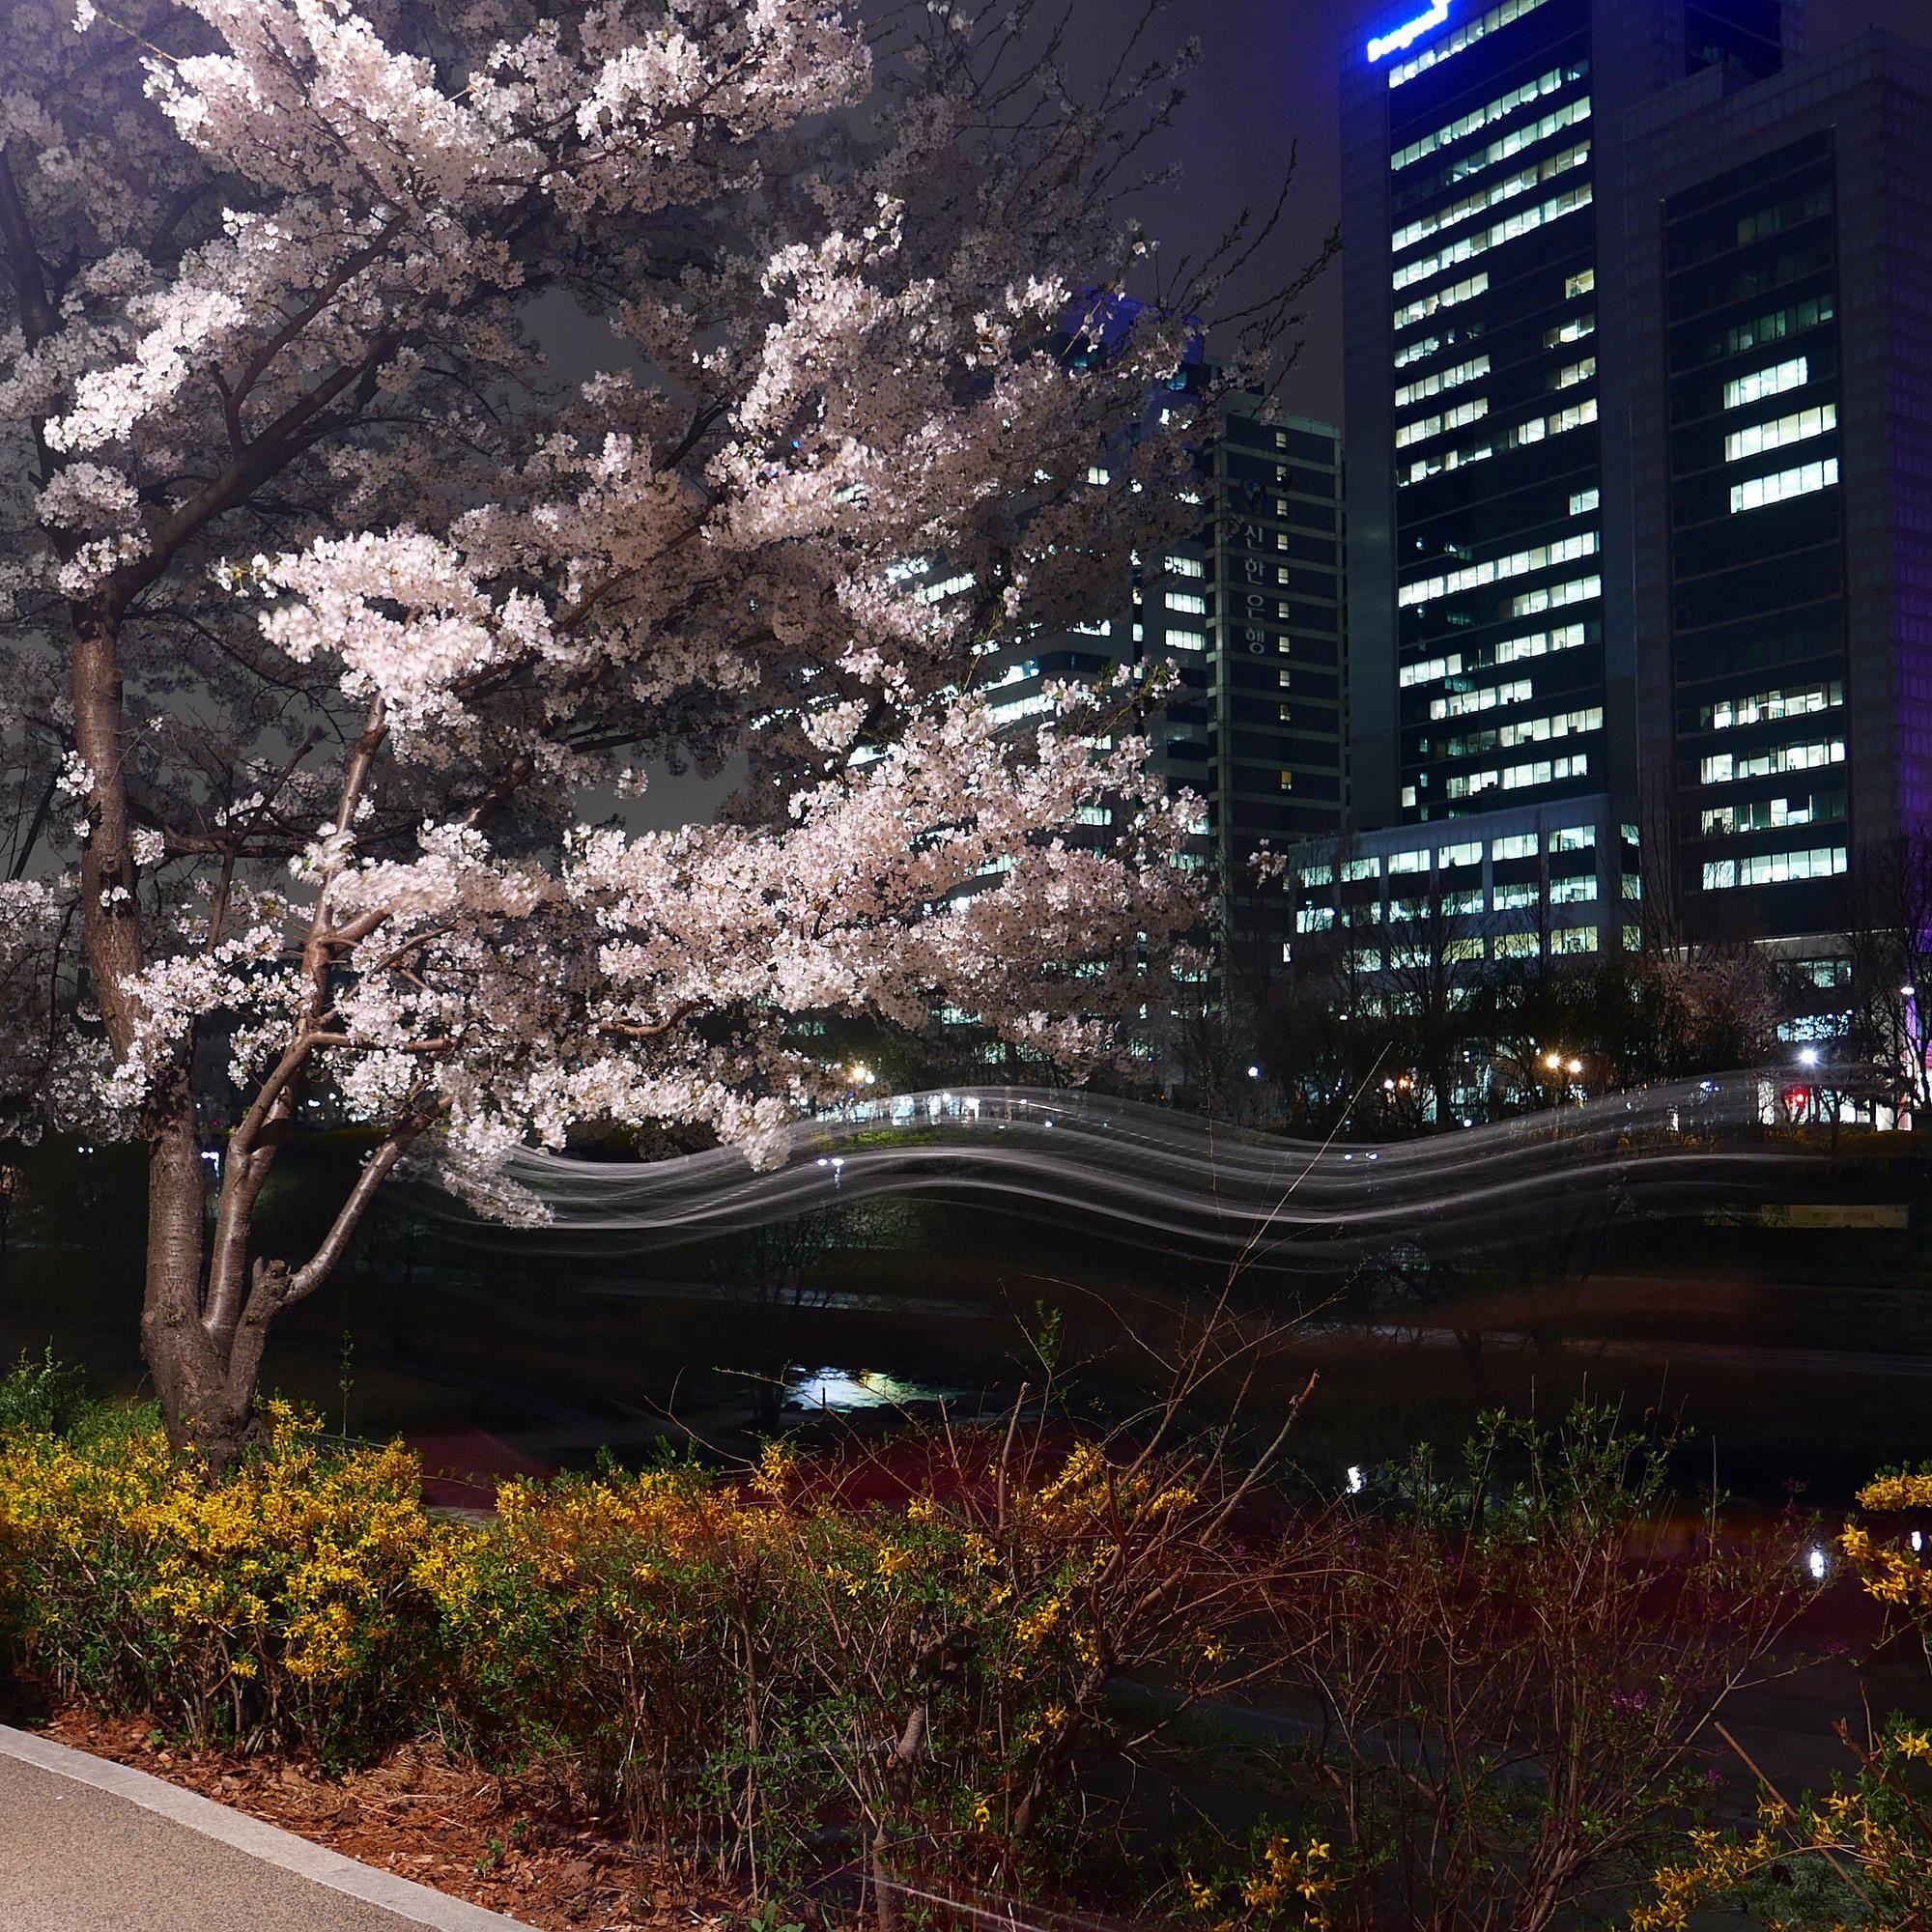 Night Cherry Blossoms And Cyclist Yangjae Seoul South Korea 2000x2000 Oc Https Ift Tt 2rgjjt2 South Korea Photography Scenery Korea Wallpaper